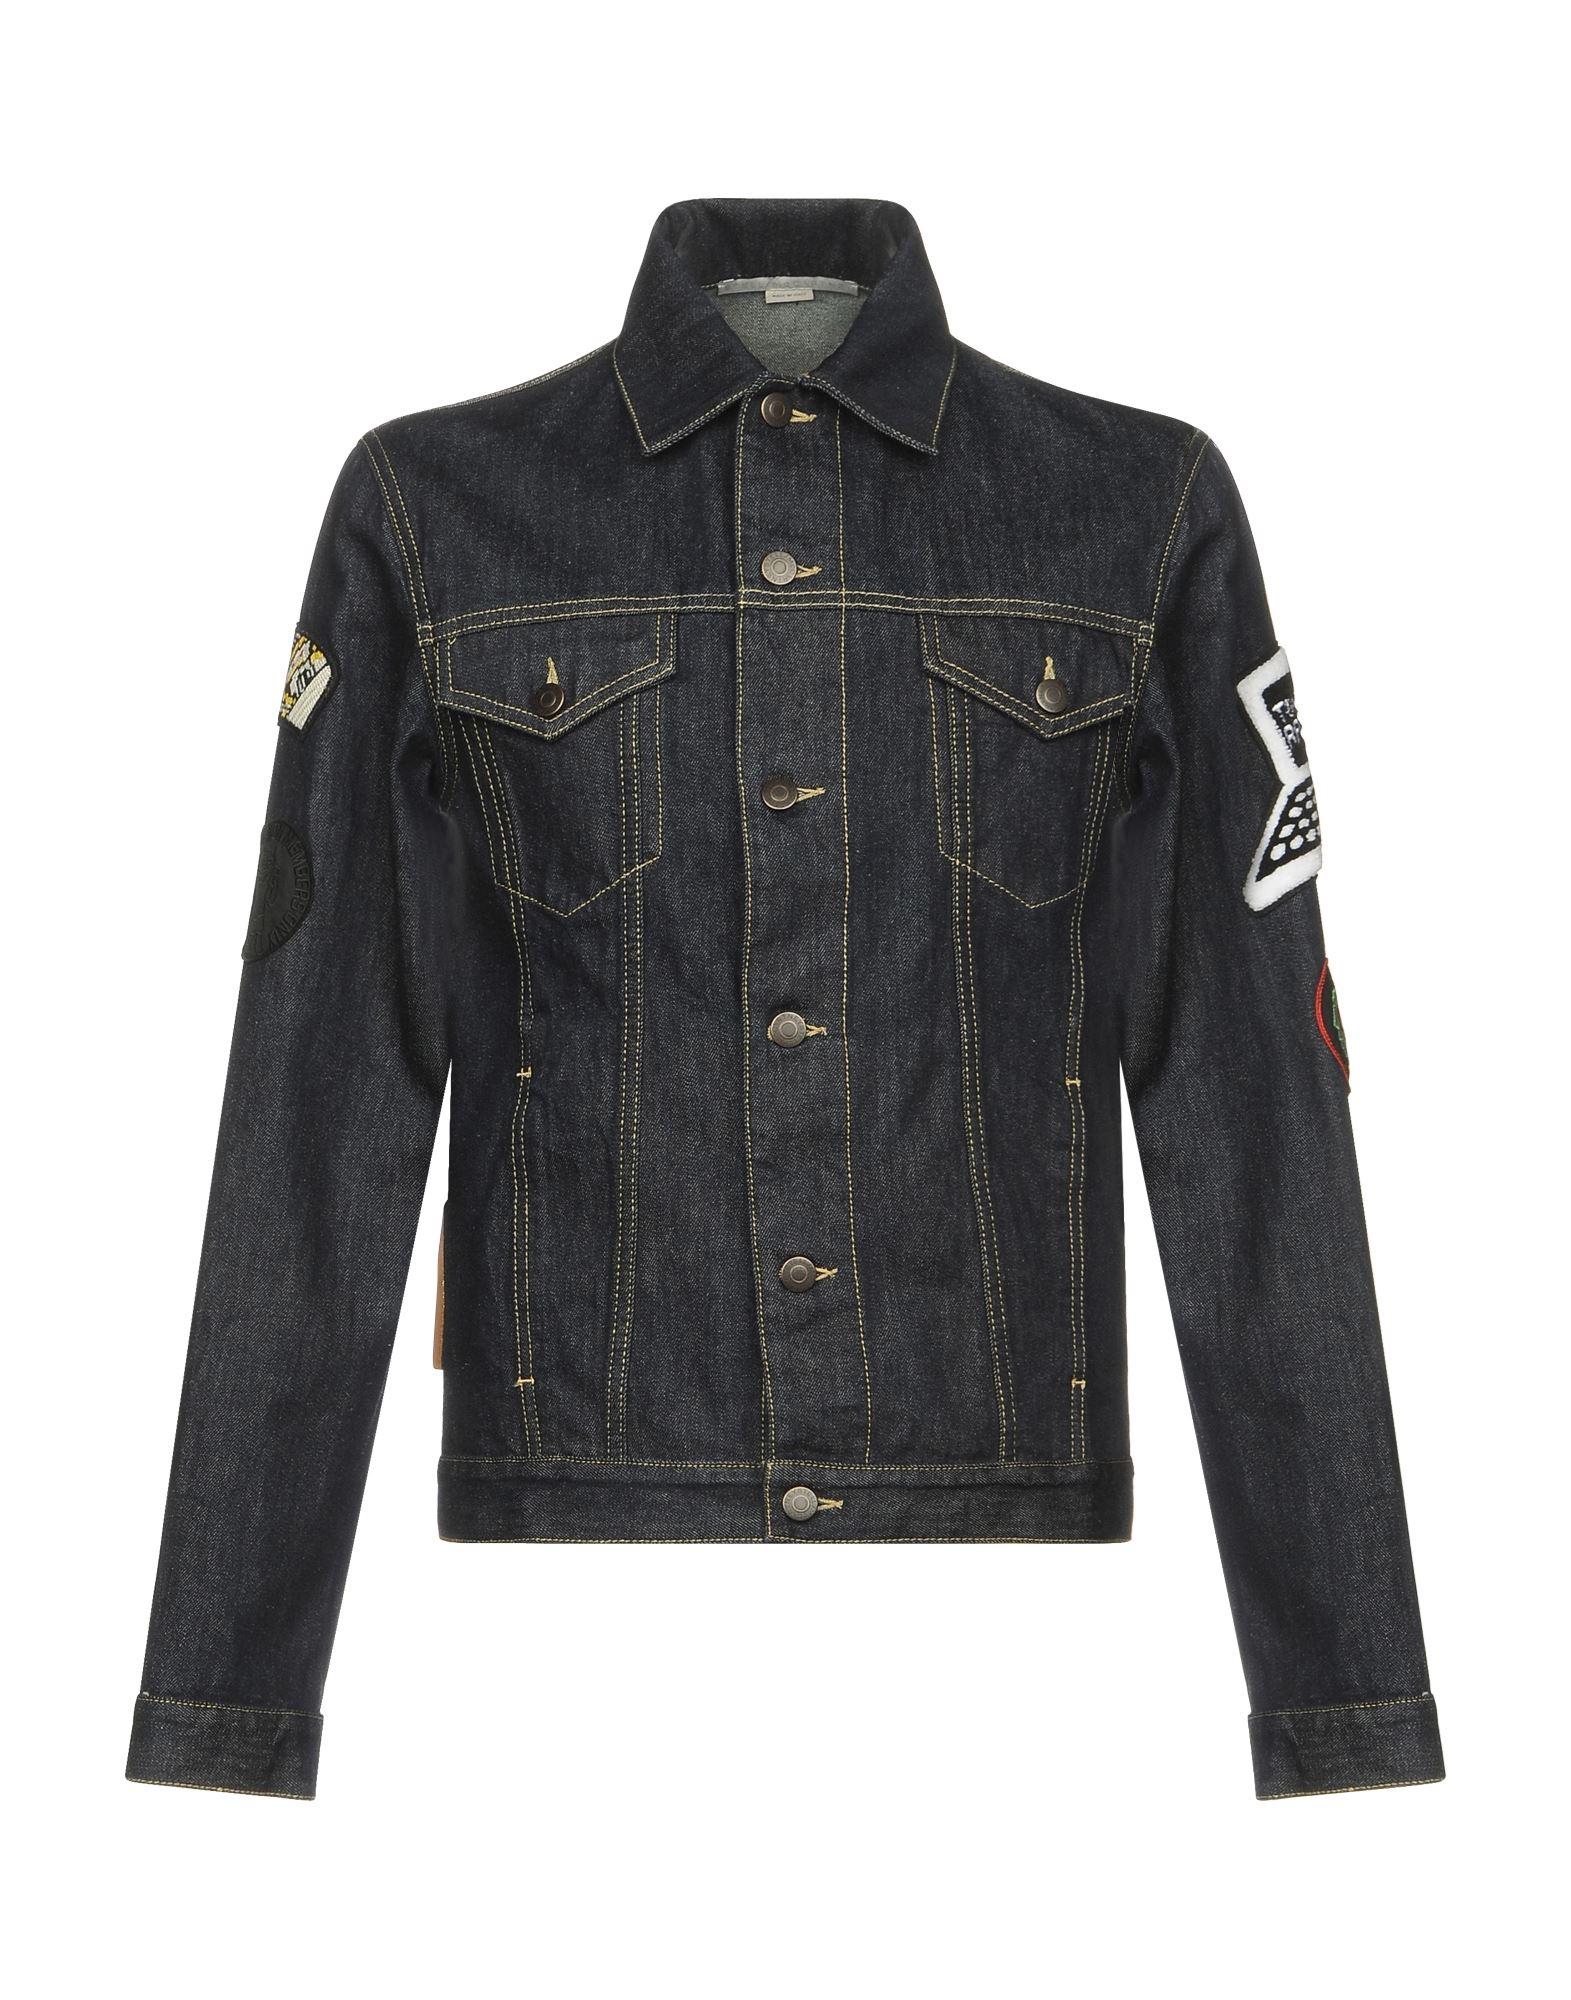 Giubbotto Jeans Stella Mccartney Uomo - Acquista online su